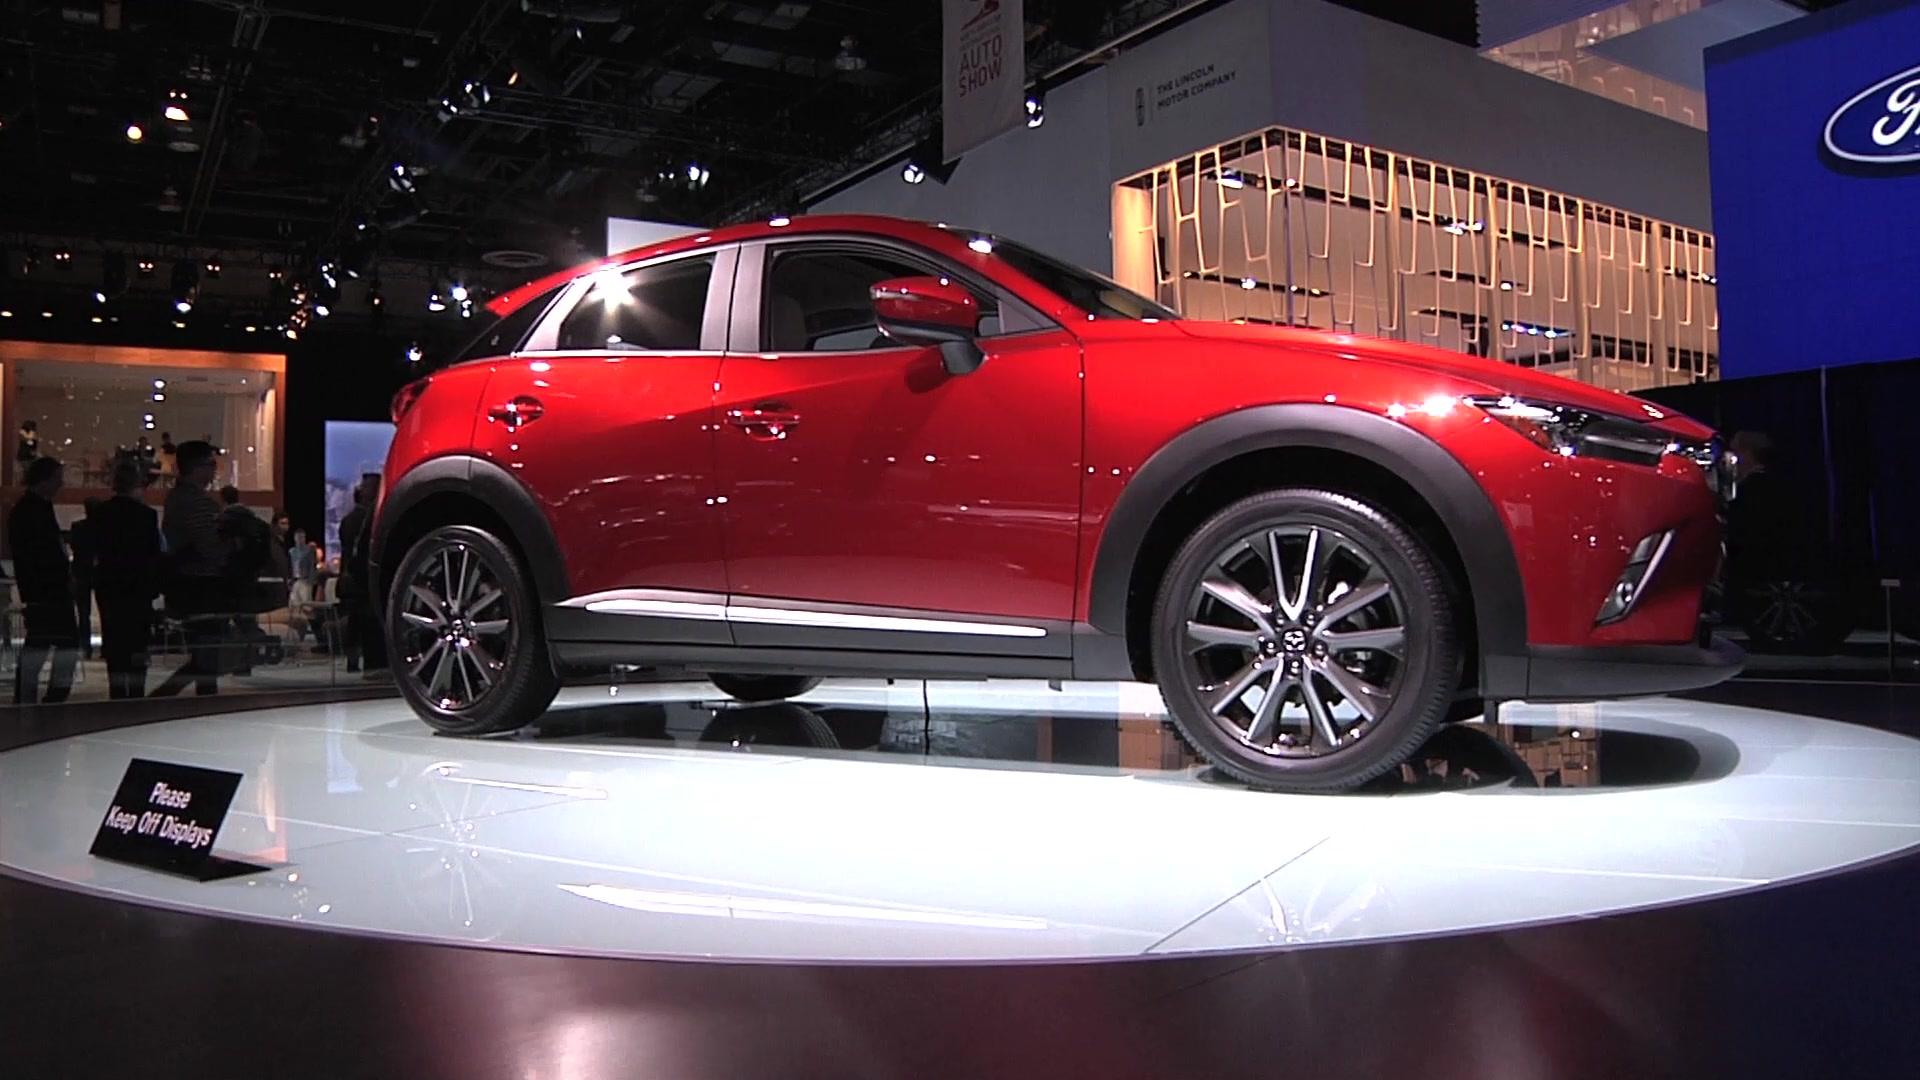 Toyota Phillips Highway >> Toyota Yaris iA significantly outsells related Mazda CX-3 ...